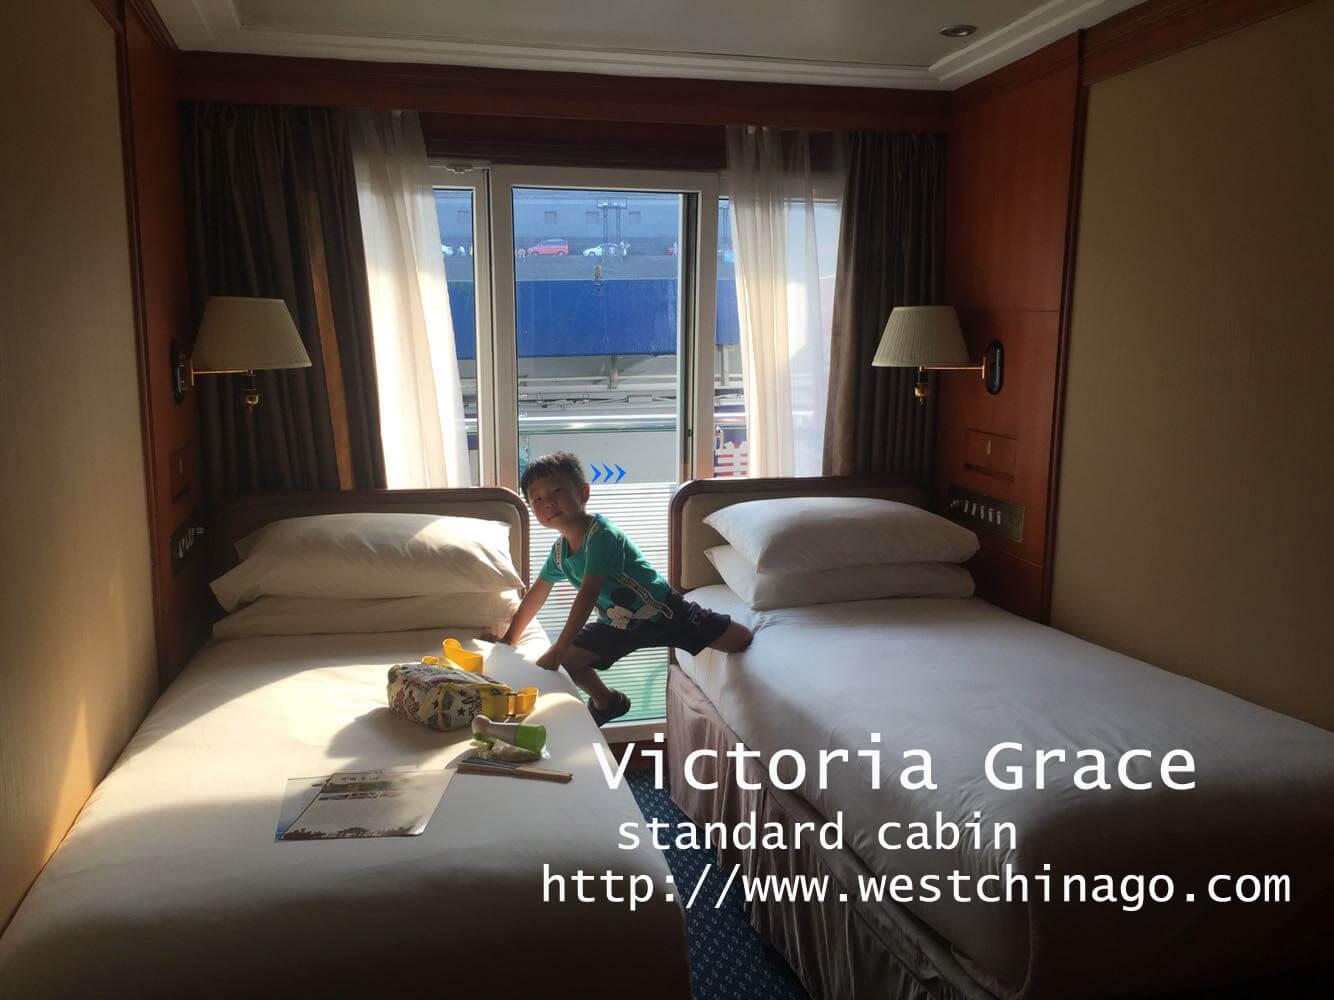 Victoria Grace standard cabin